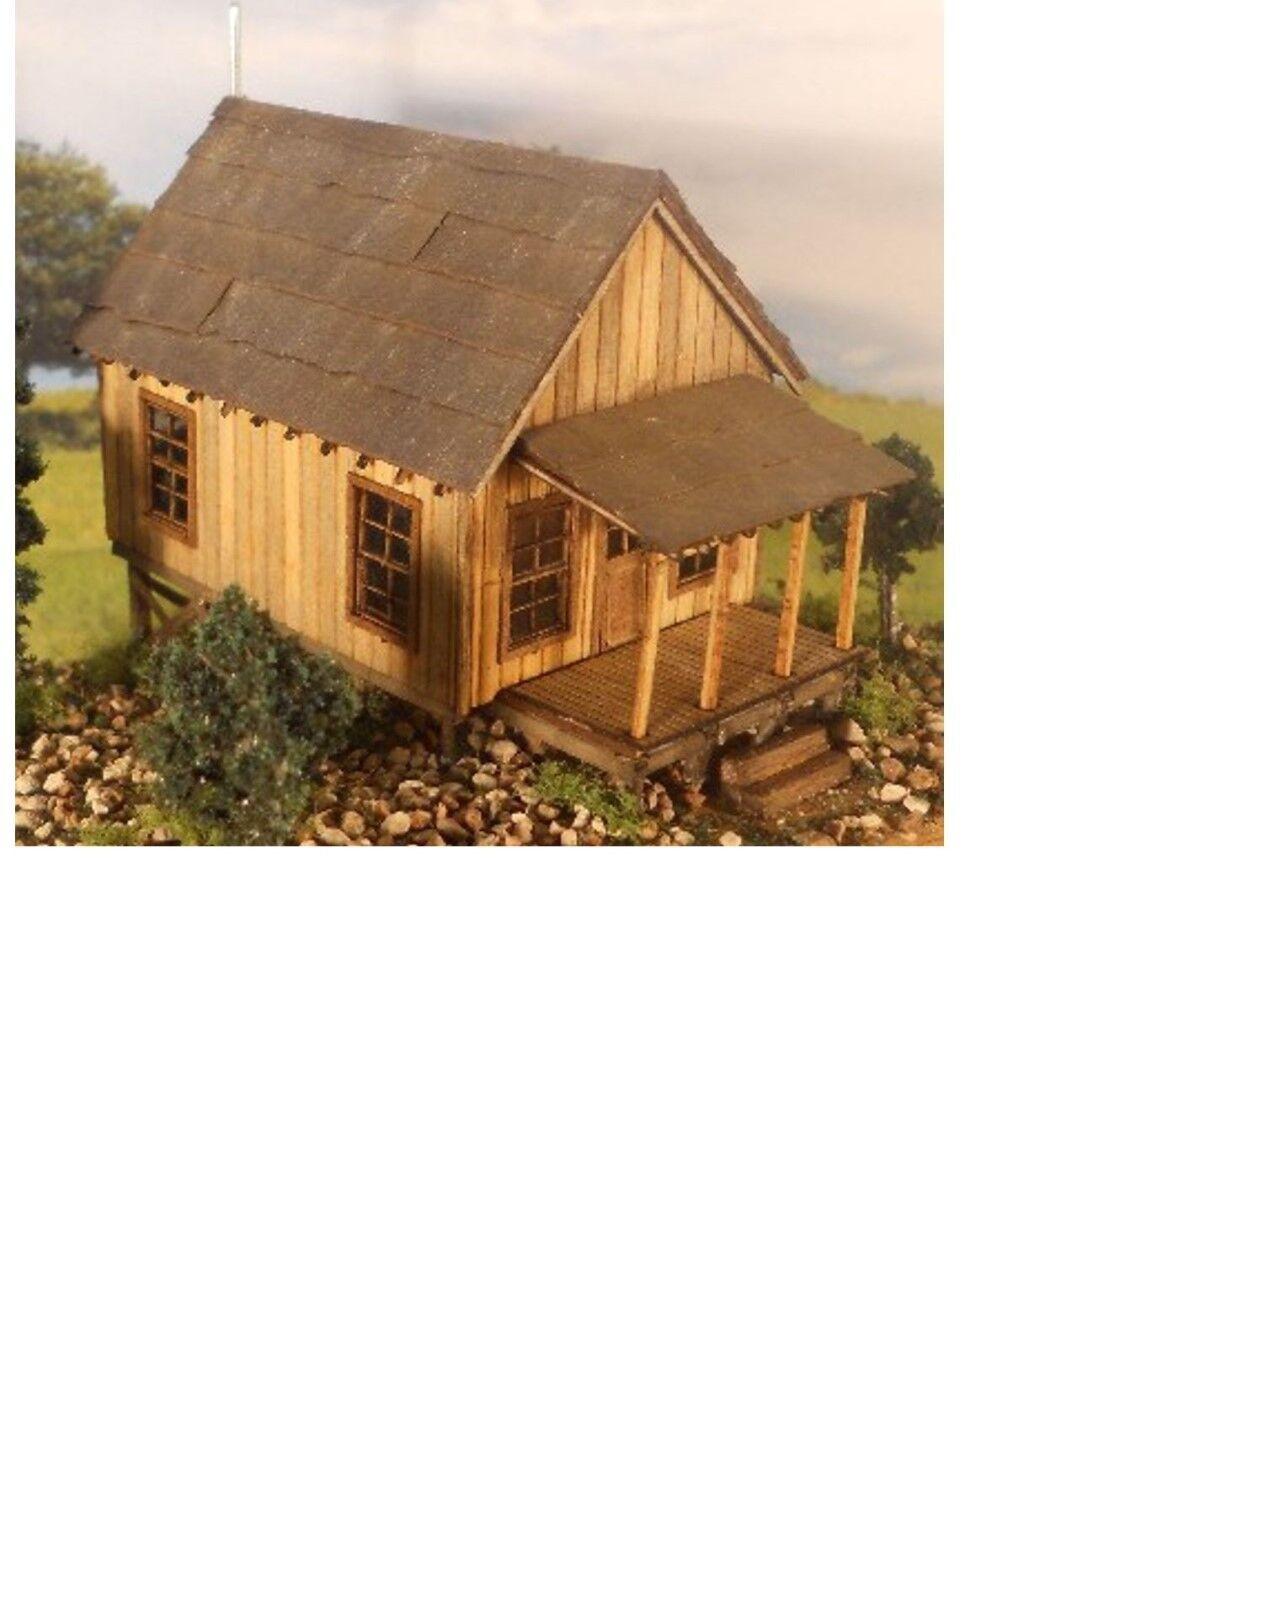 H0 / HOn3    Carl's cabin Kit 2048